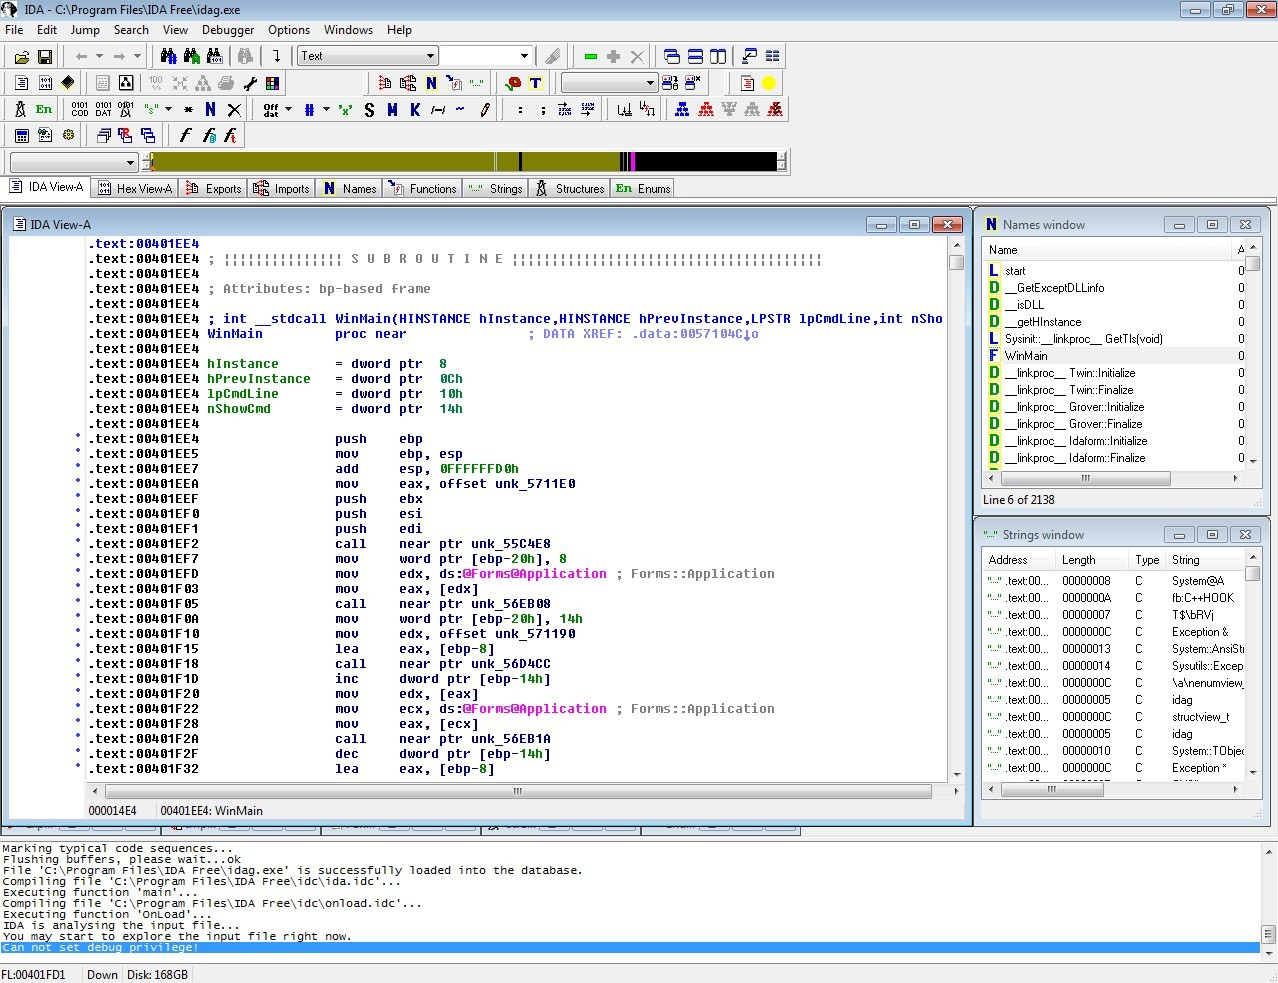 Screenshot 1 - IDA Pro Freeware